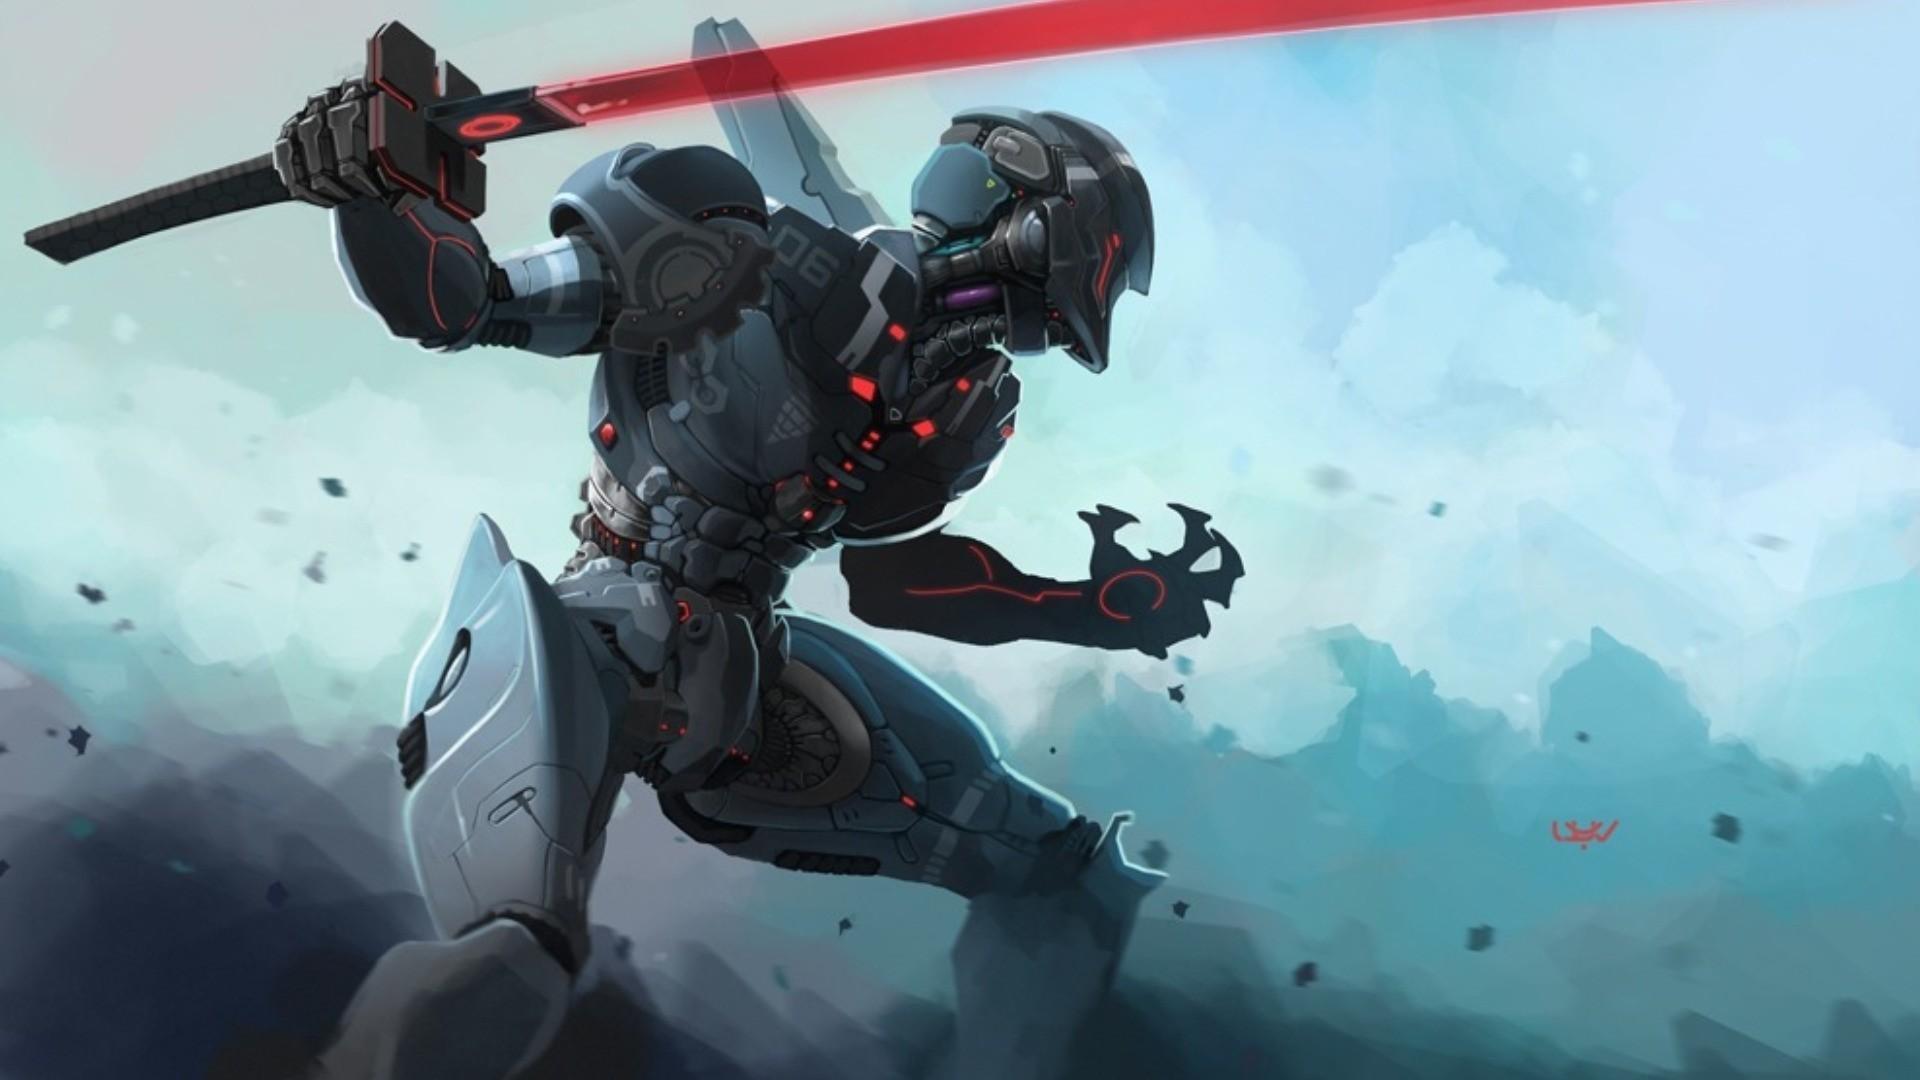 Cyborg Wallpaper Free